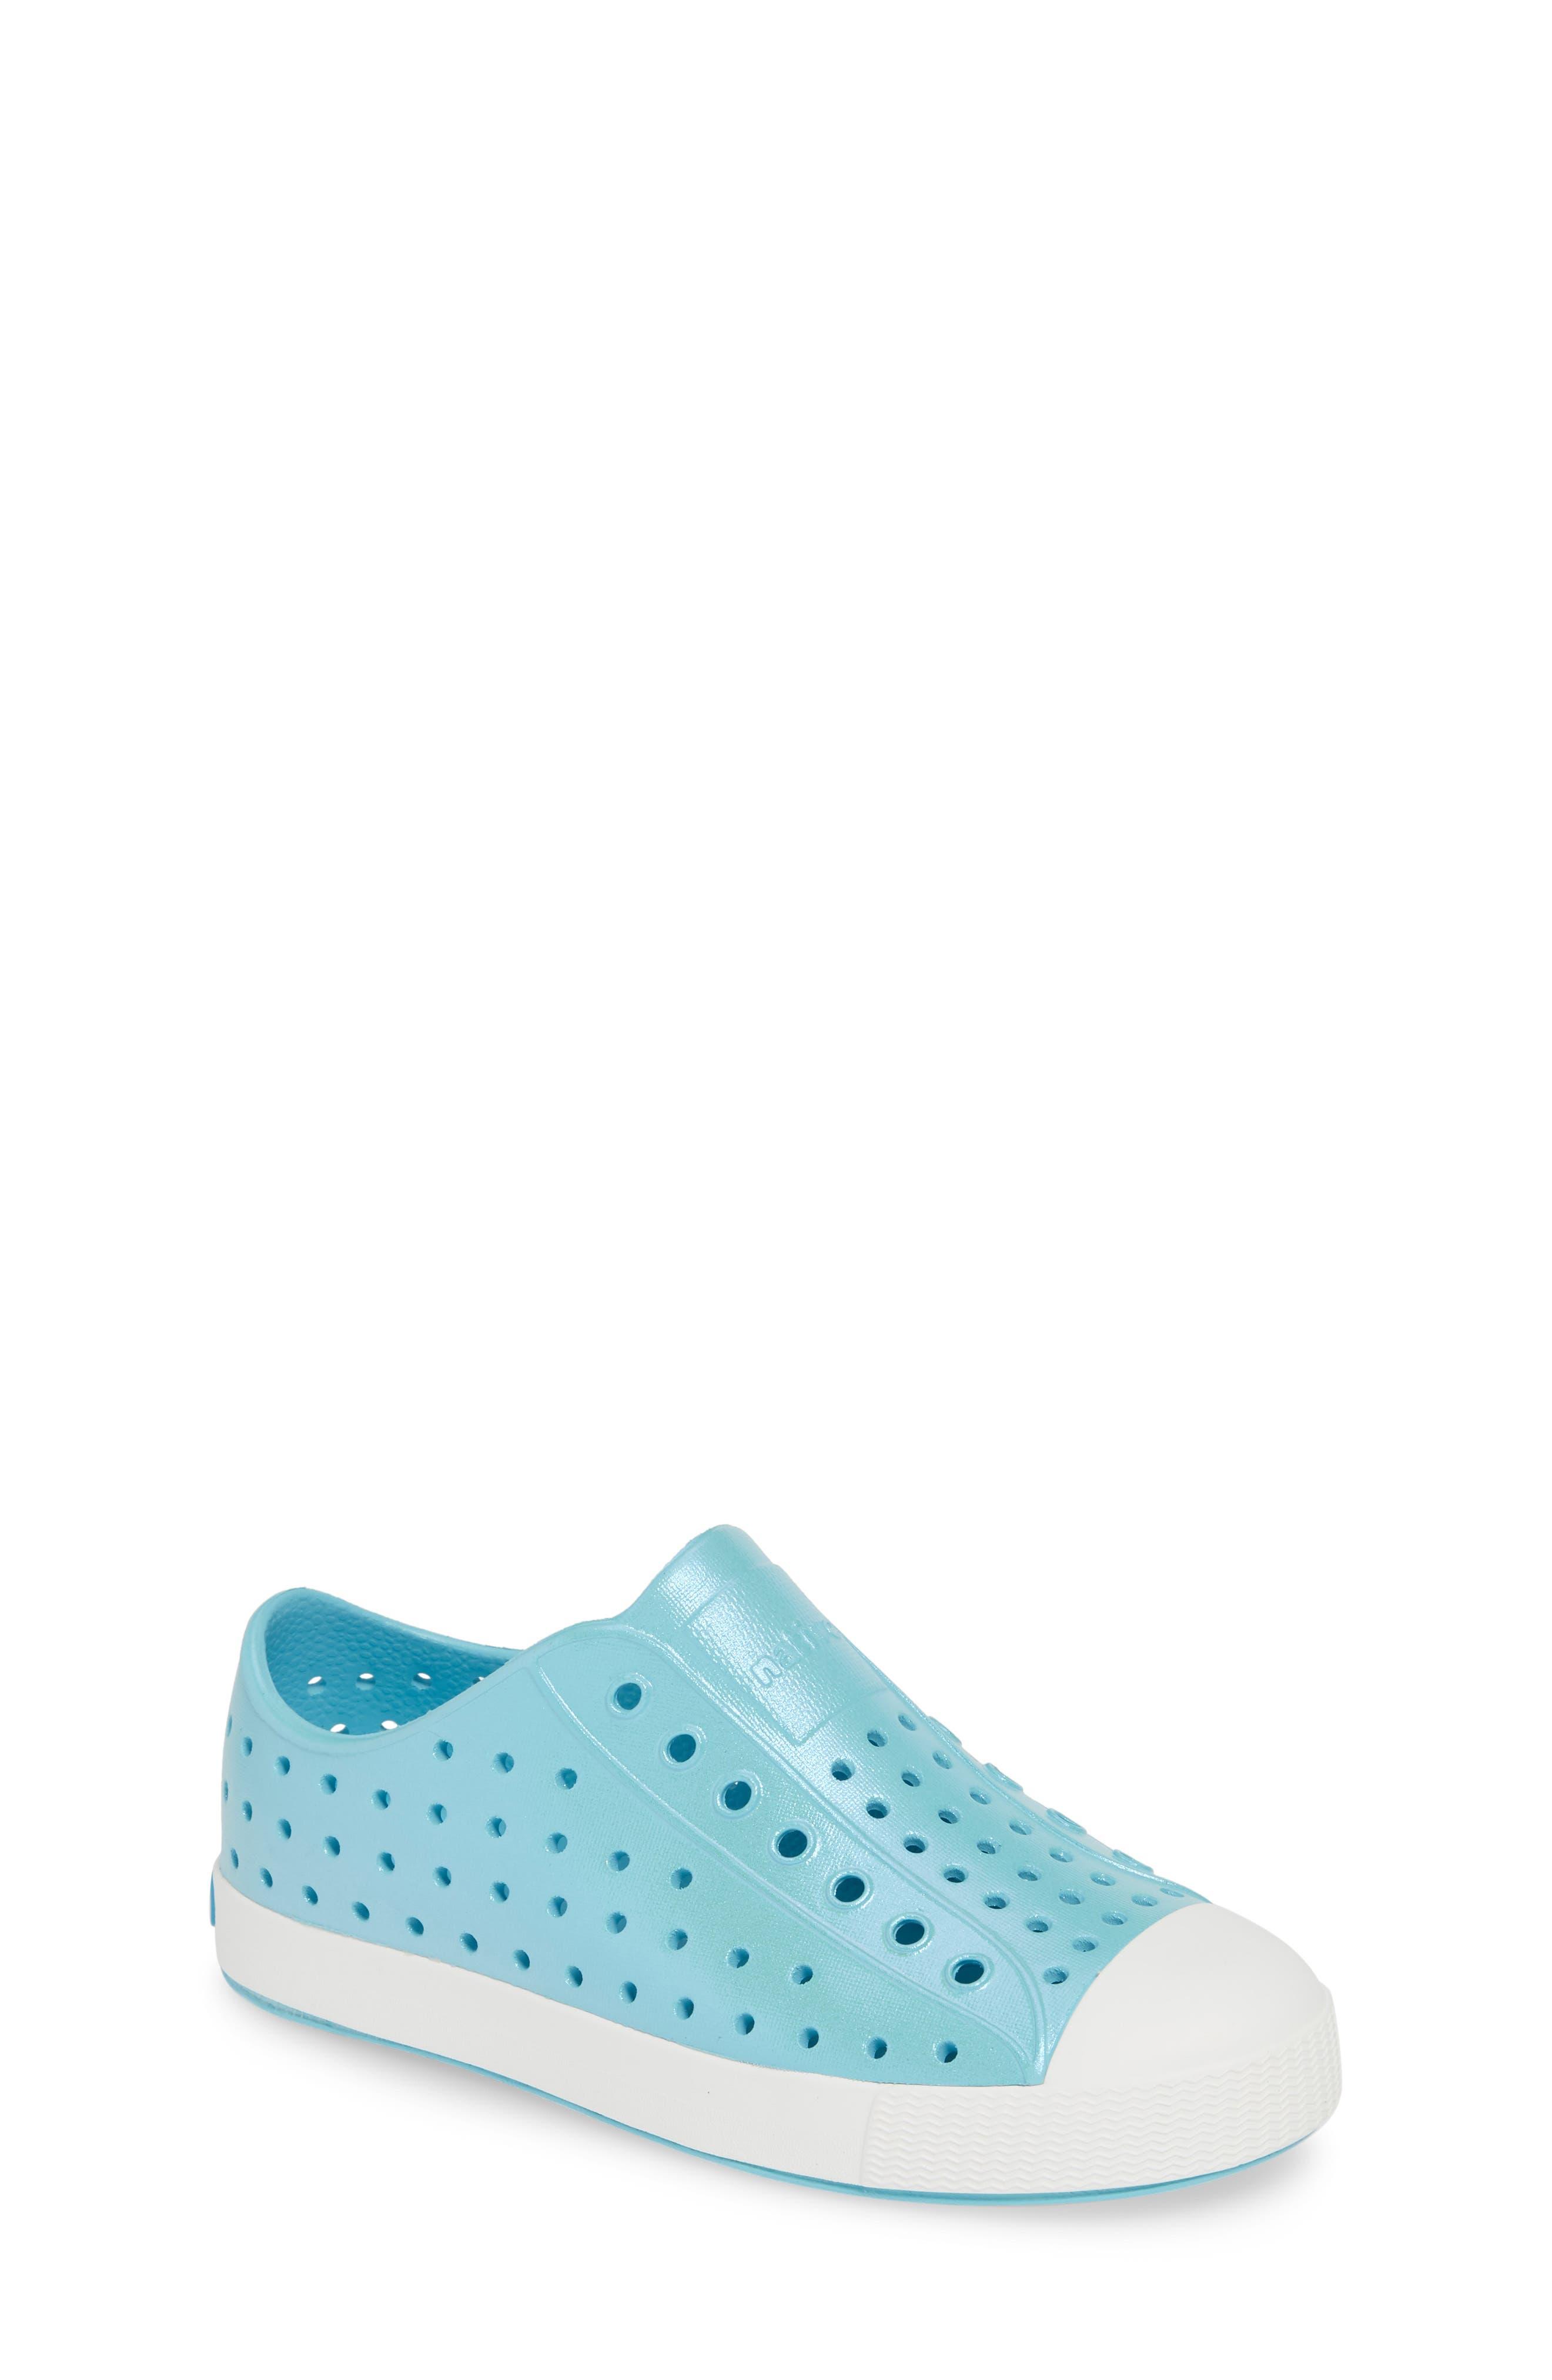 ff5273530f93eb Native Shoes